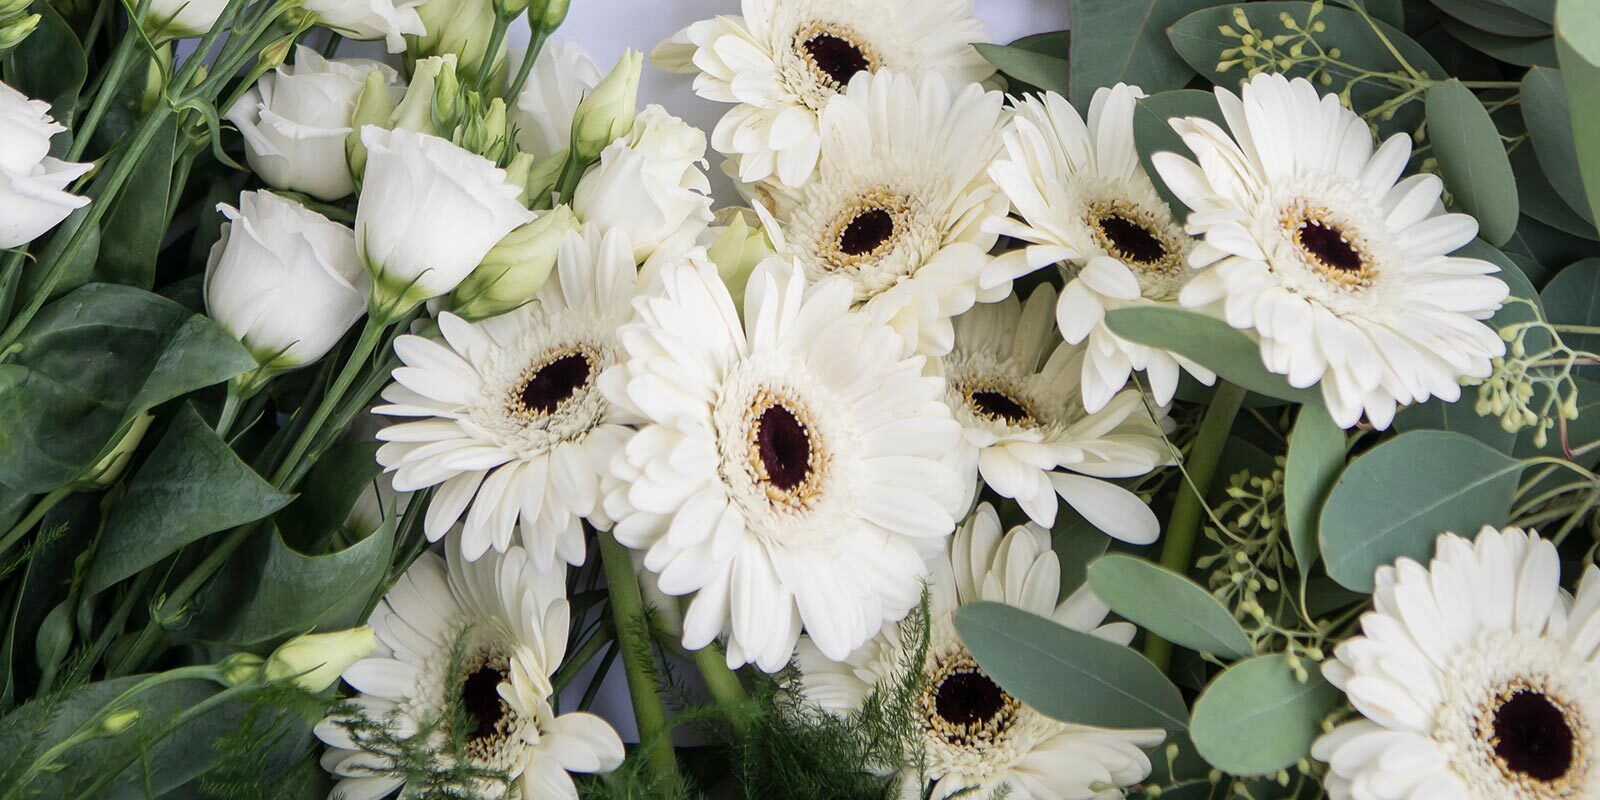 Floriss Blomstertorget